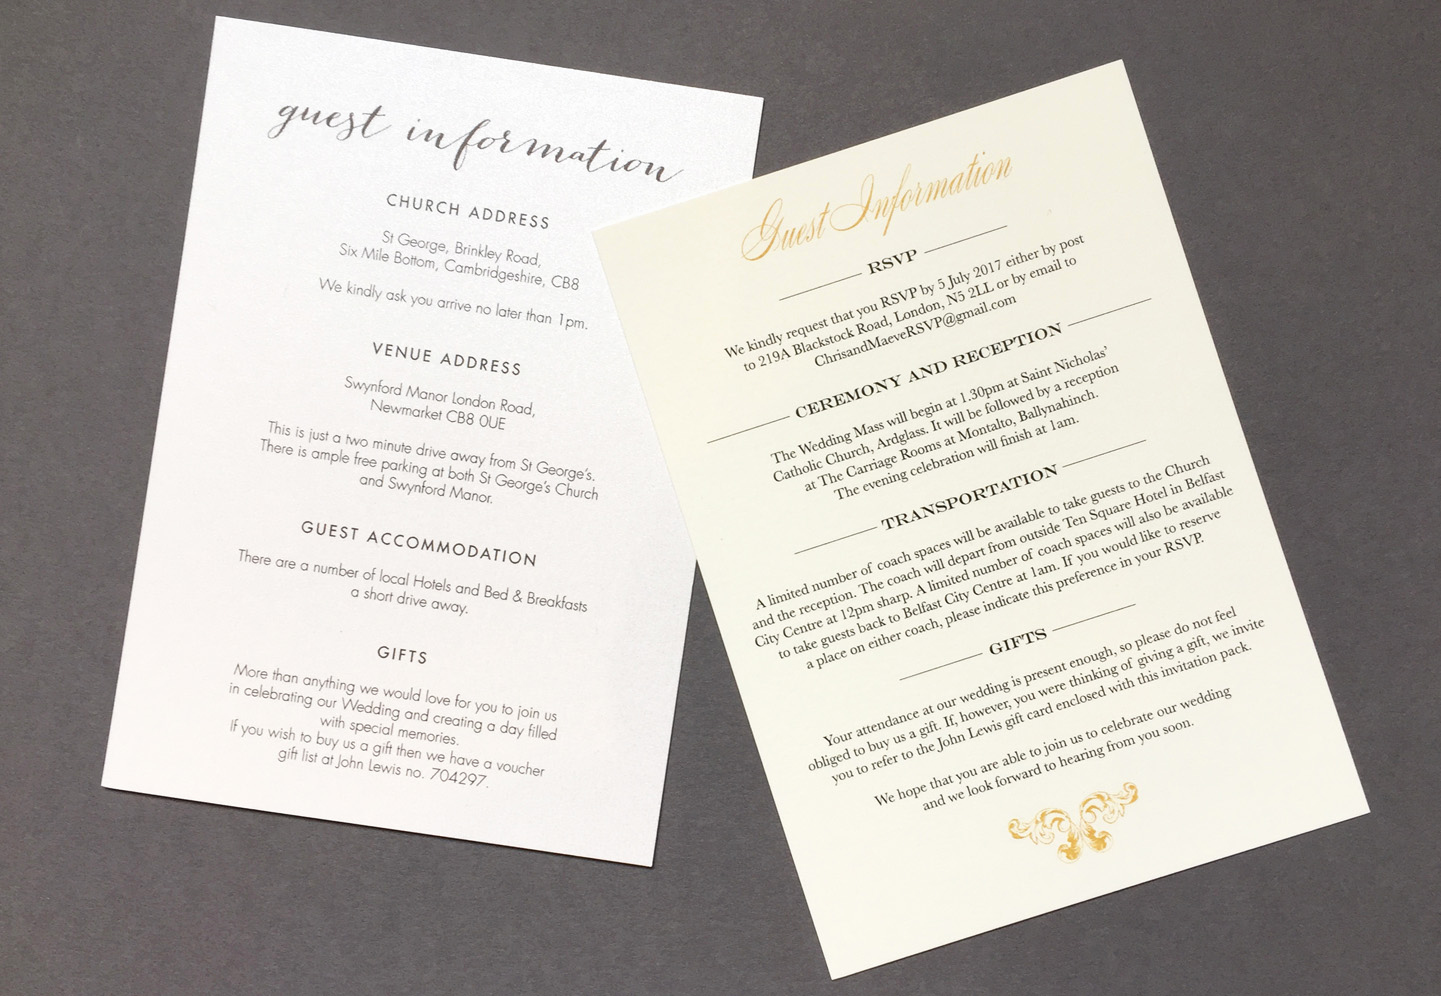 Wedding Invitation Information Card Beautiful Wedding Guest Information Cards What to Include